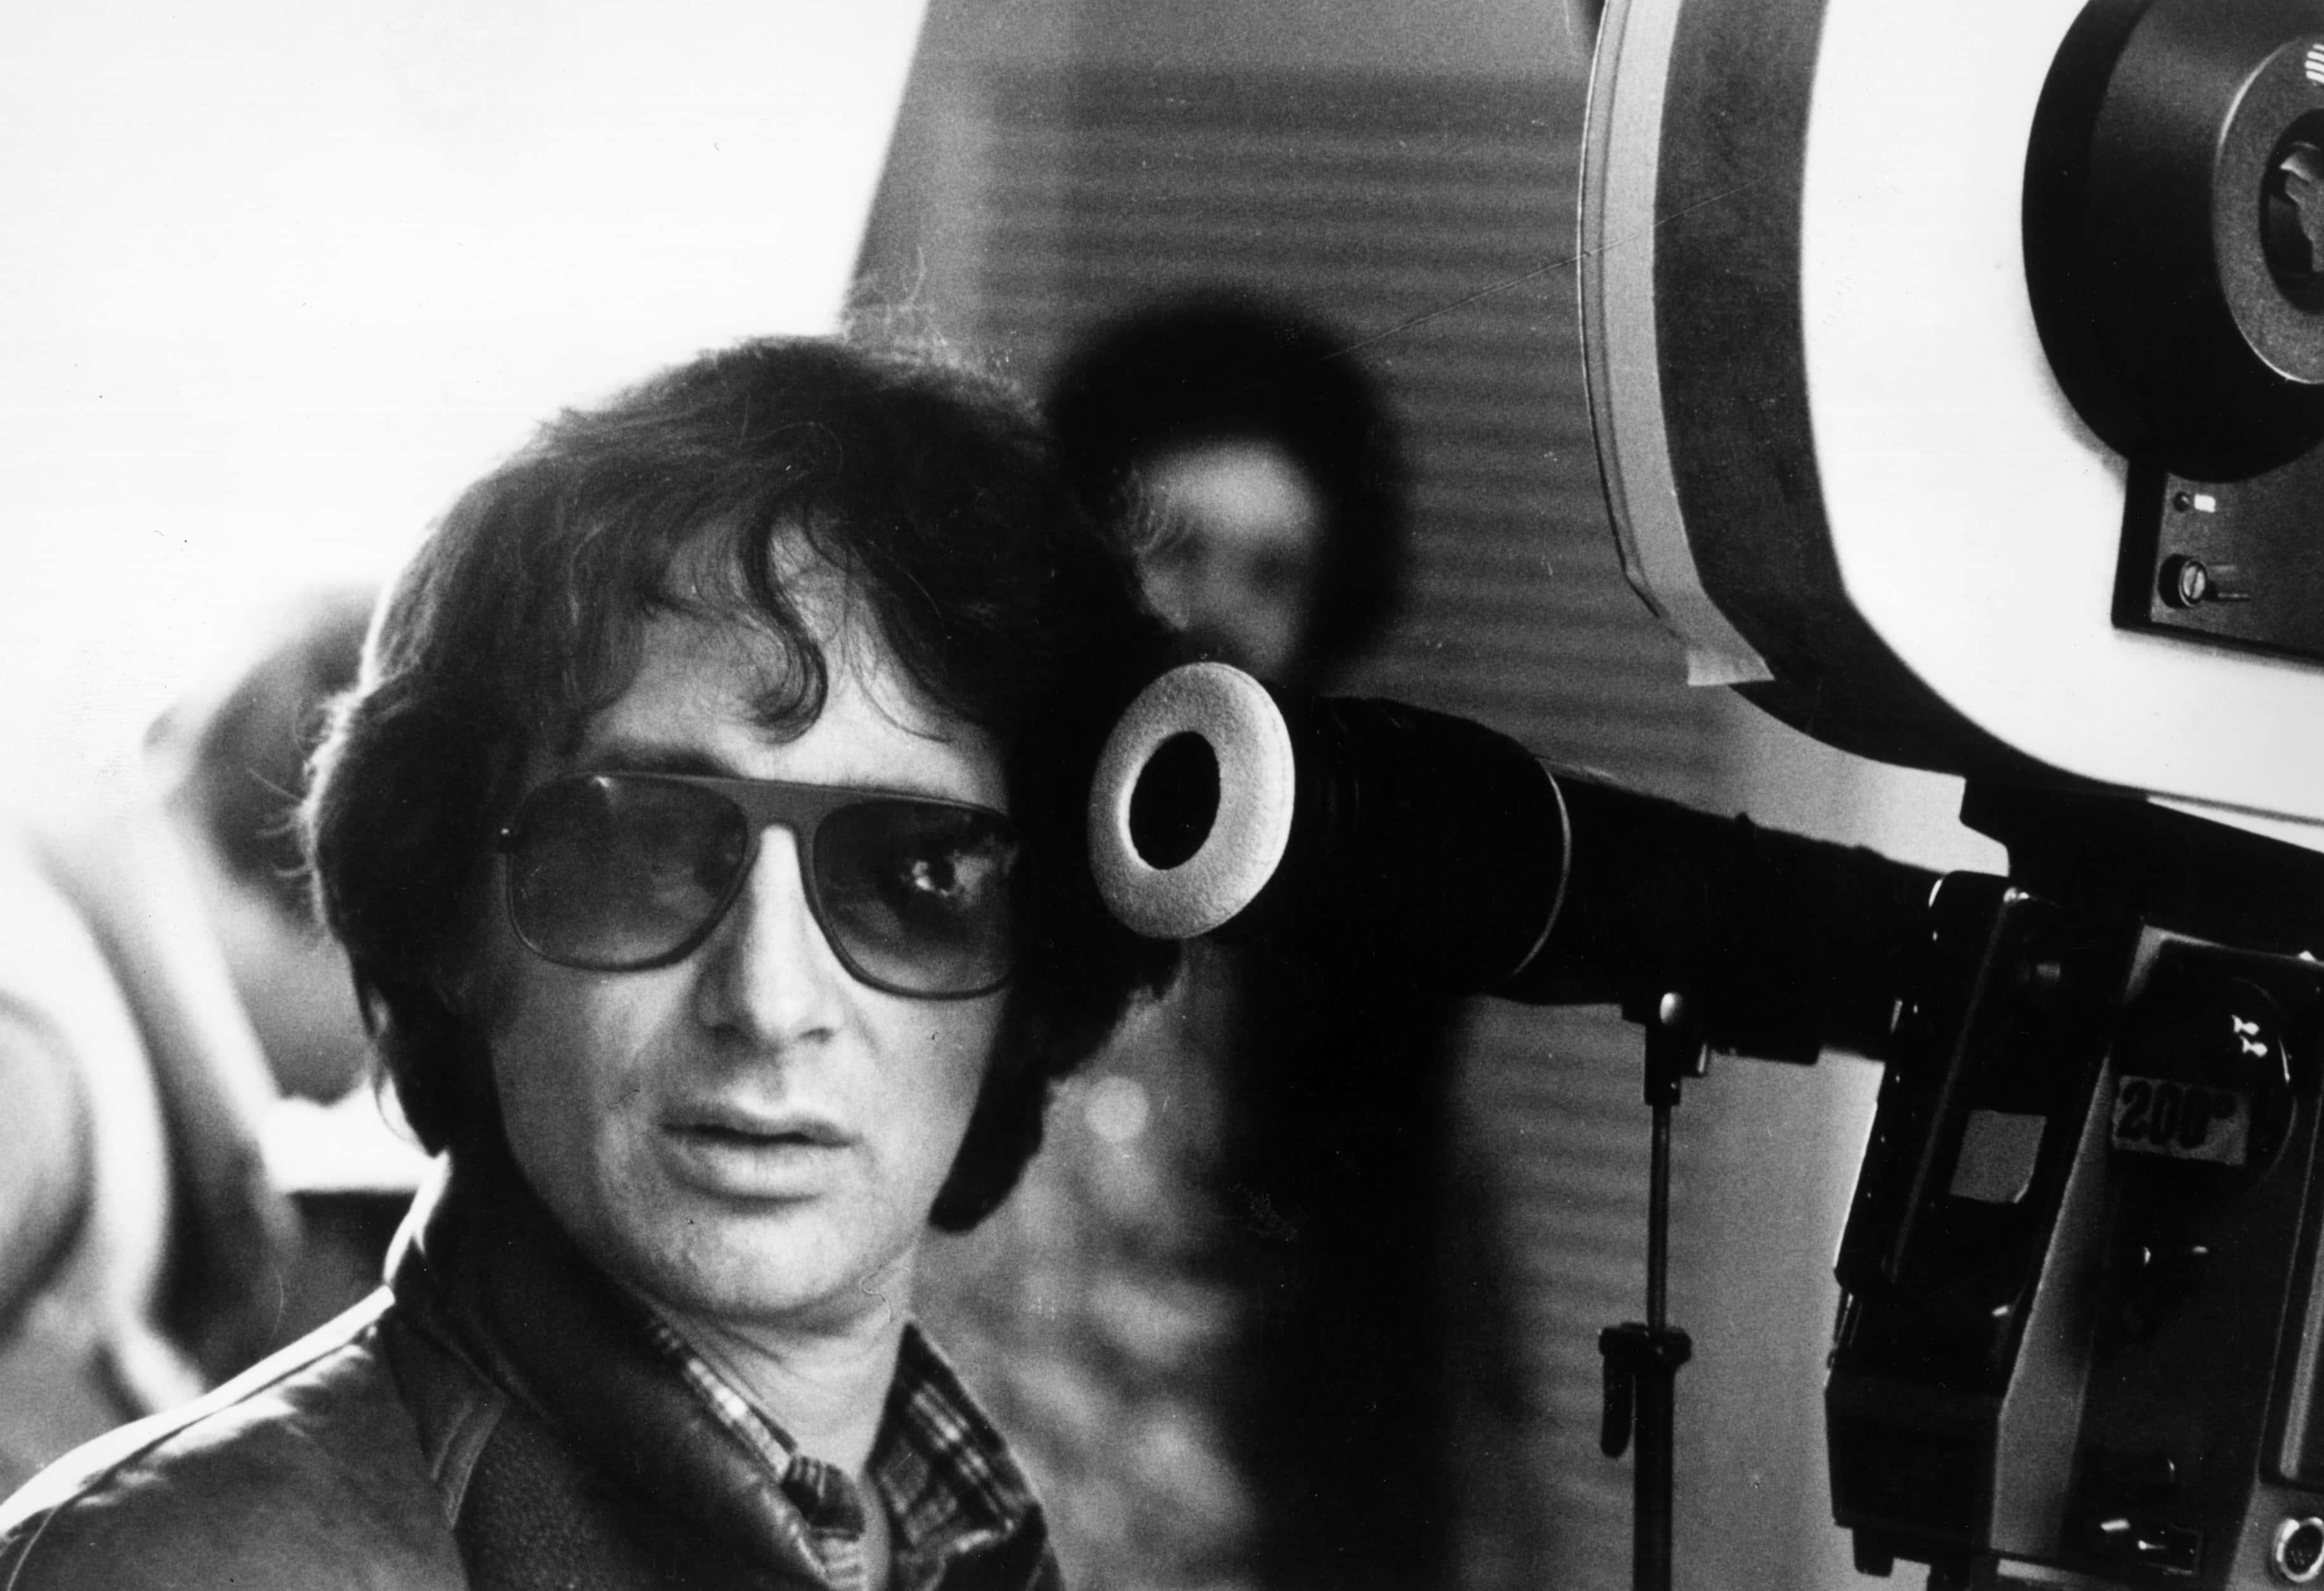 Steven Spielberg Facts